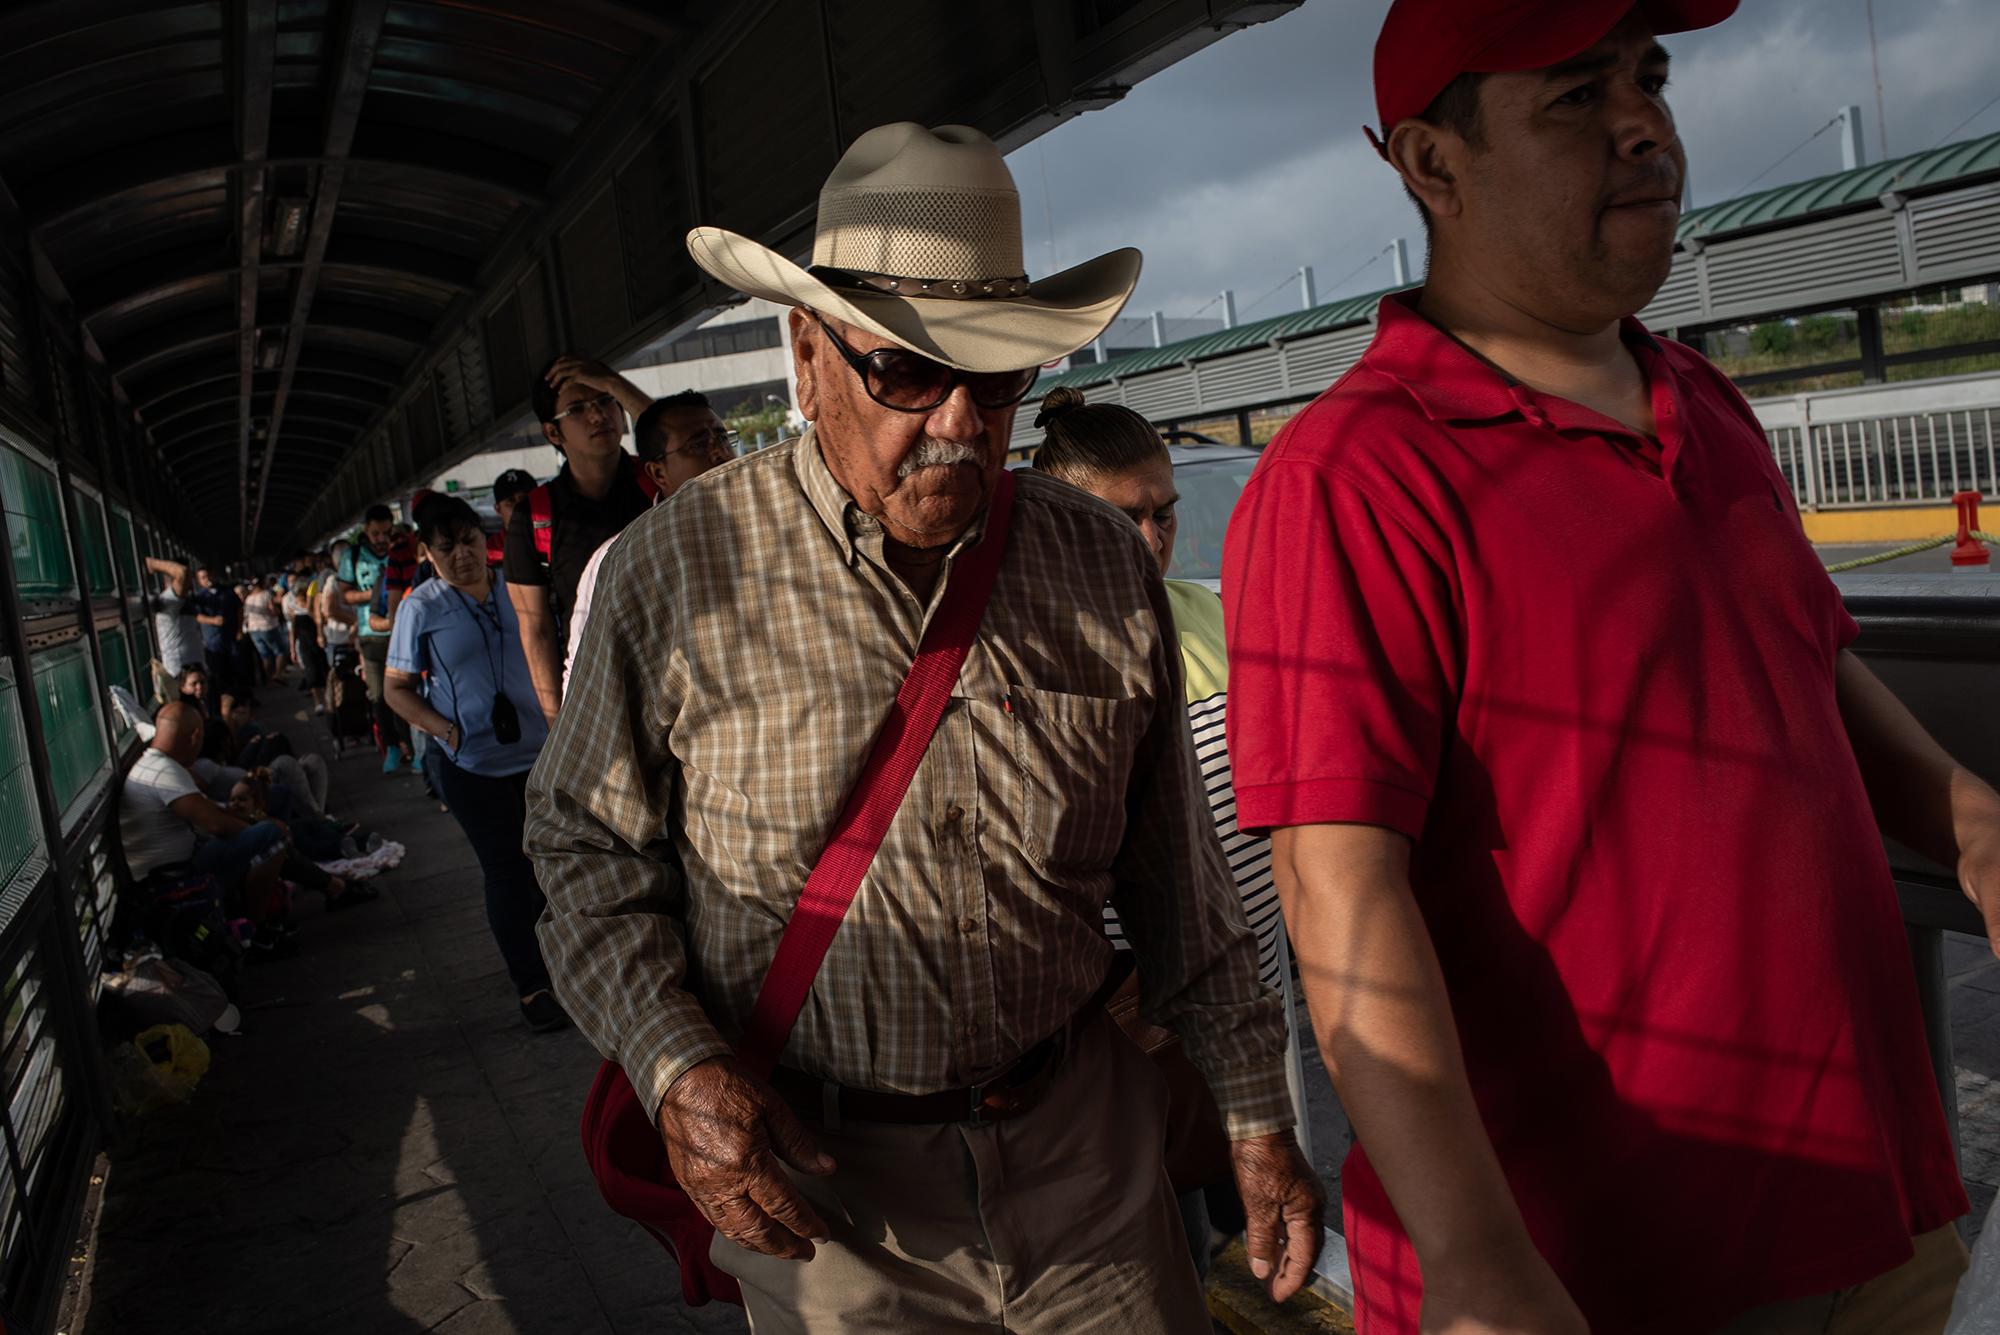 General view at Laredo / Nuevo Laredo International Bridge. June 25th, 2018. Photographer: Luján Agusti.